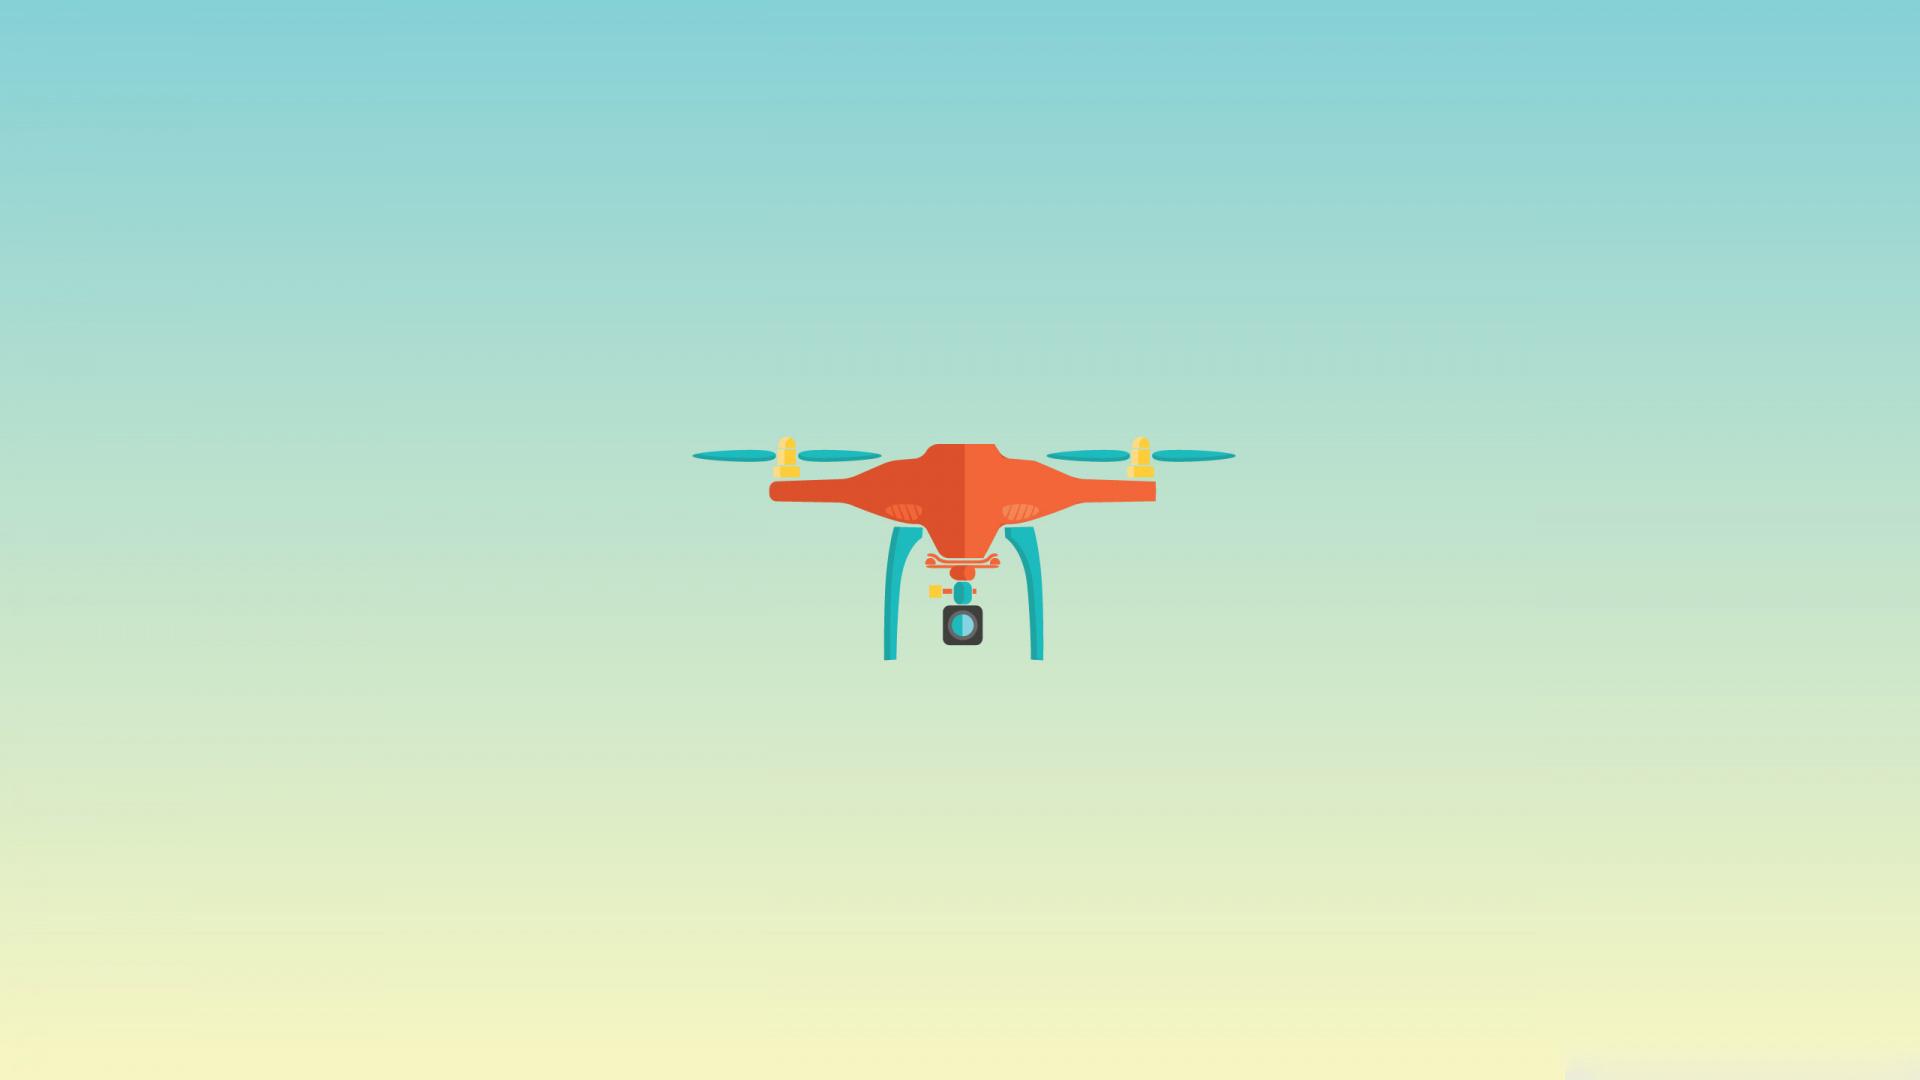 Anime Cellphone Wallpaper Drone Wallpaper Hd Download Free Pixelstalk Net